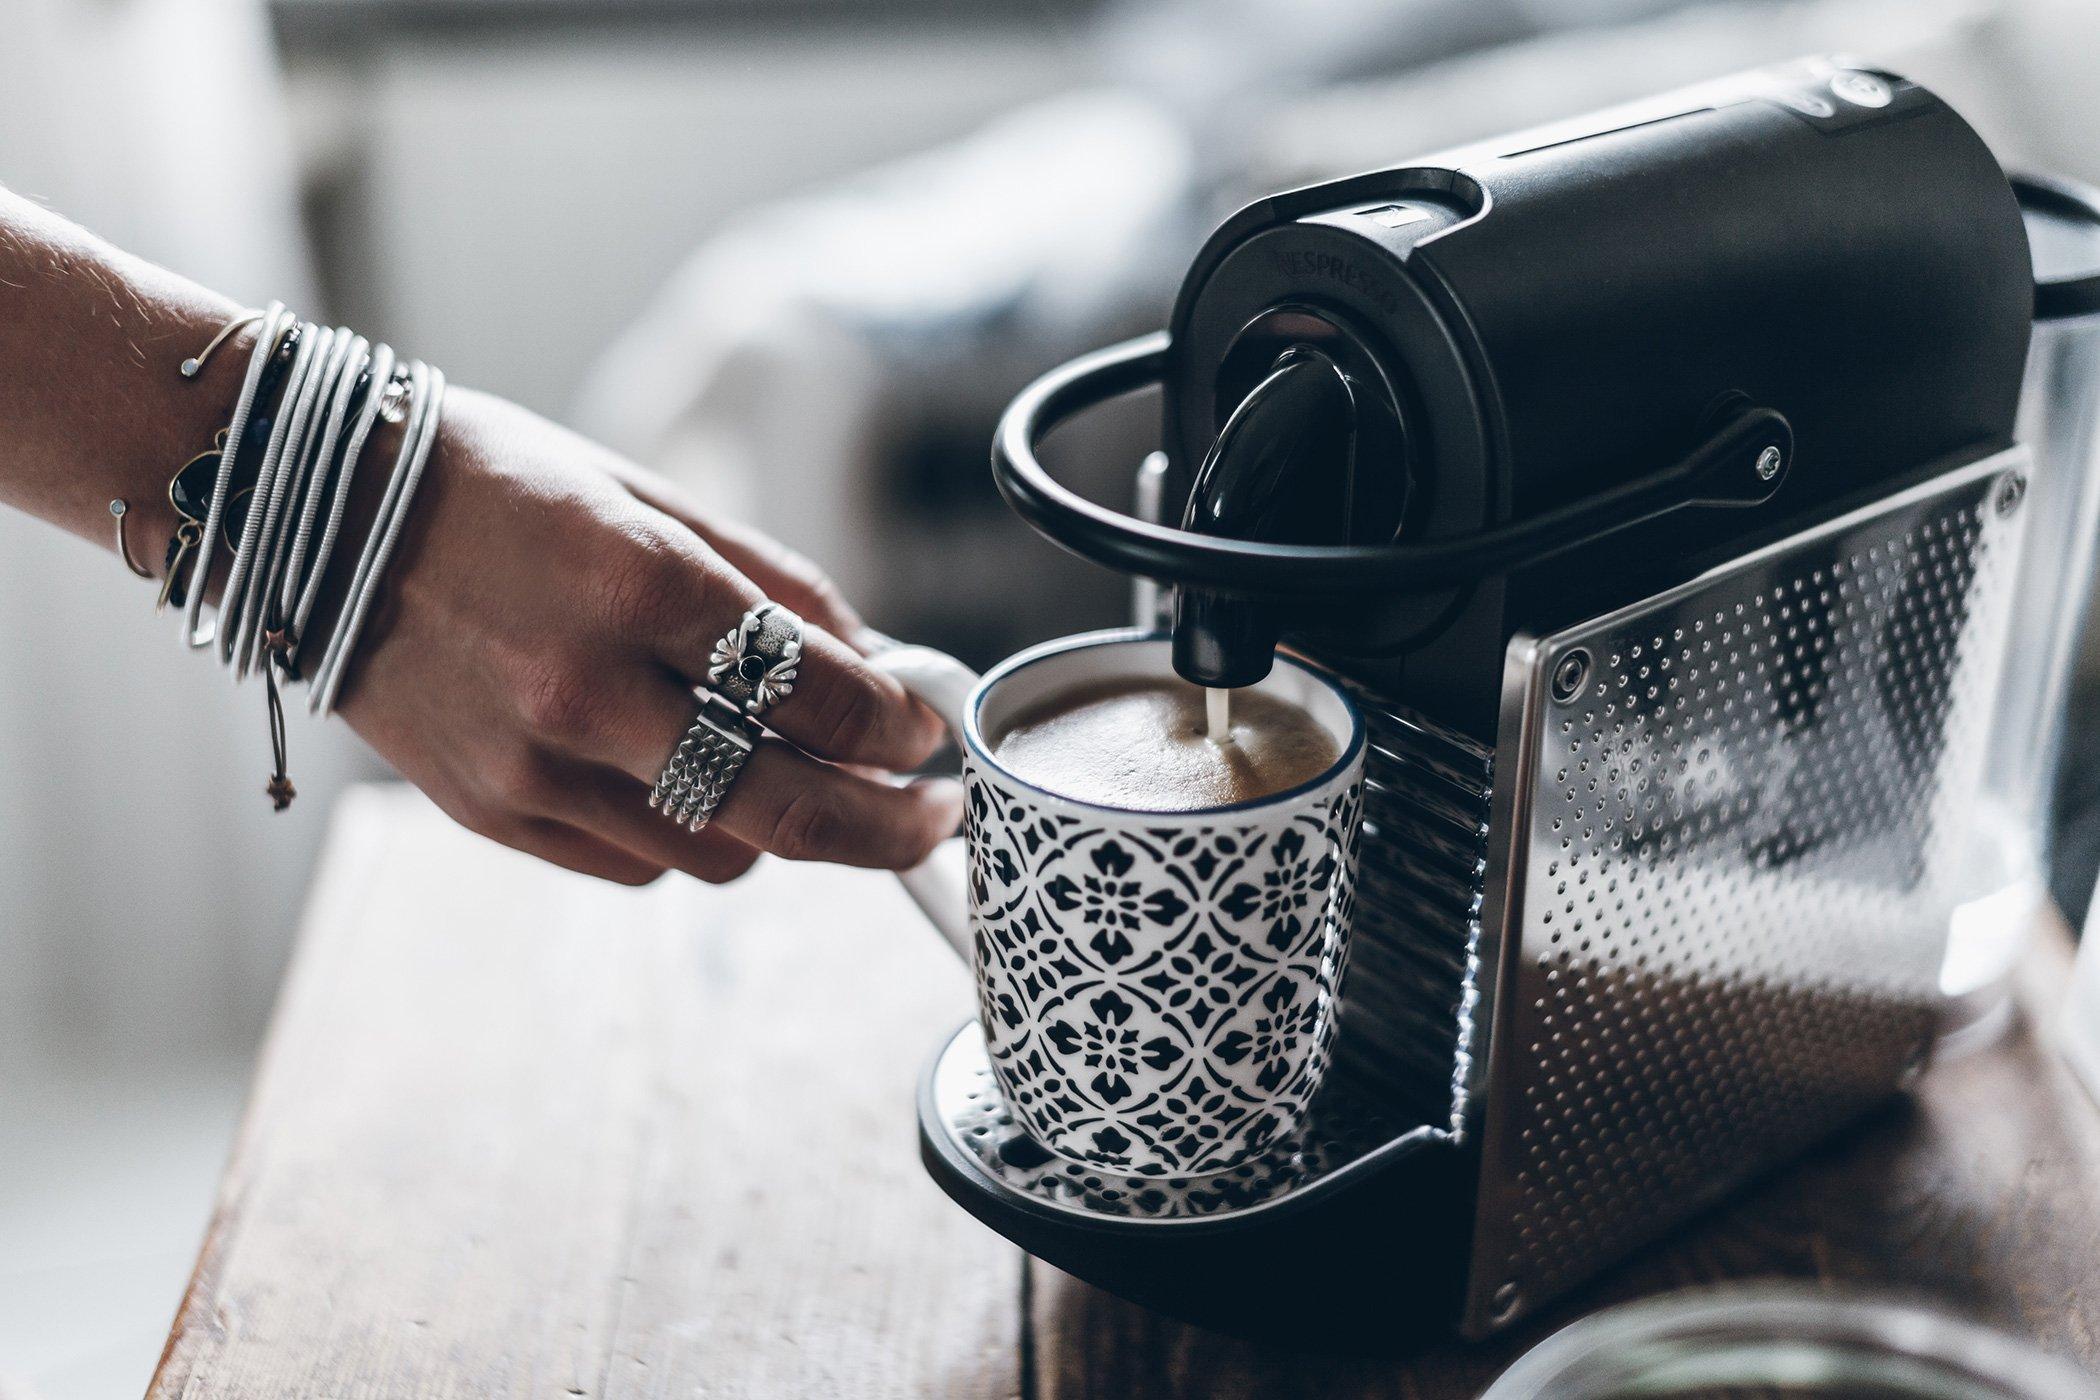 mikuta-nespresso-2